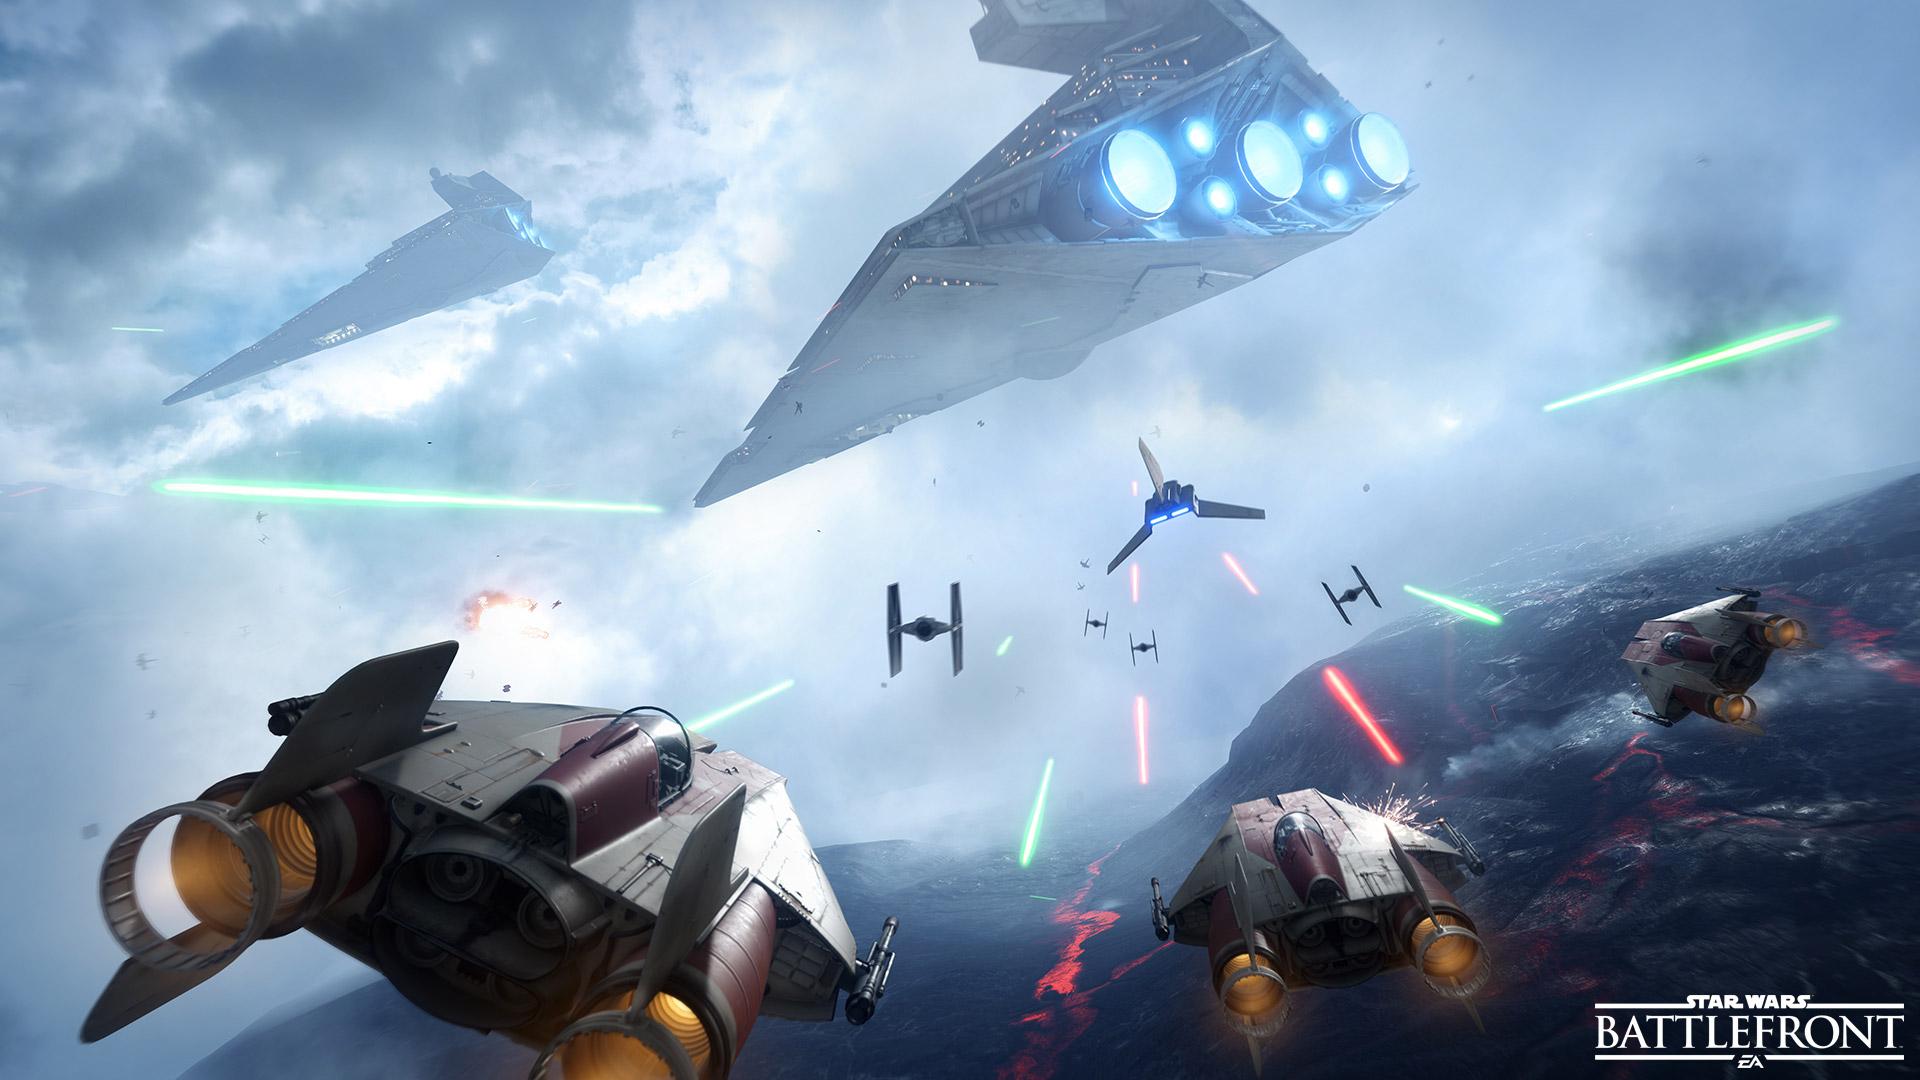 Star Wars: Battlefront launch problem – solution